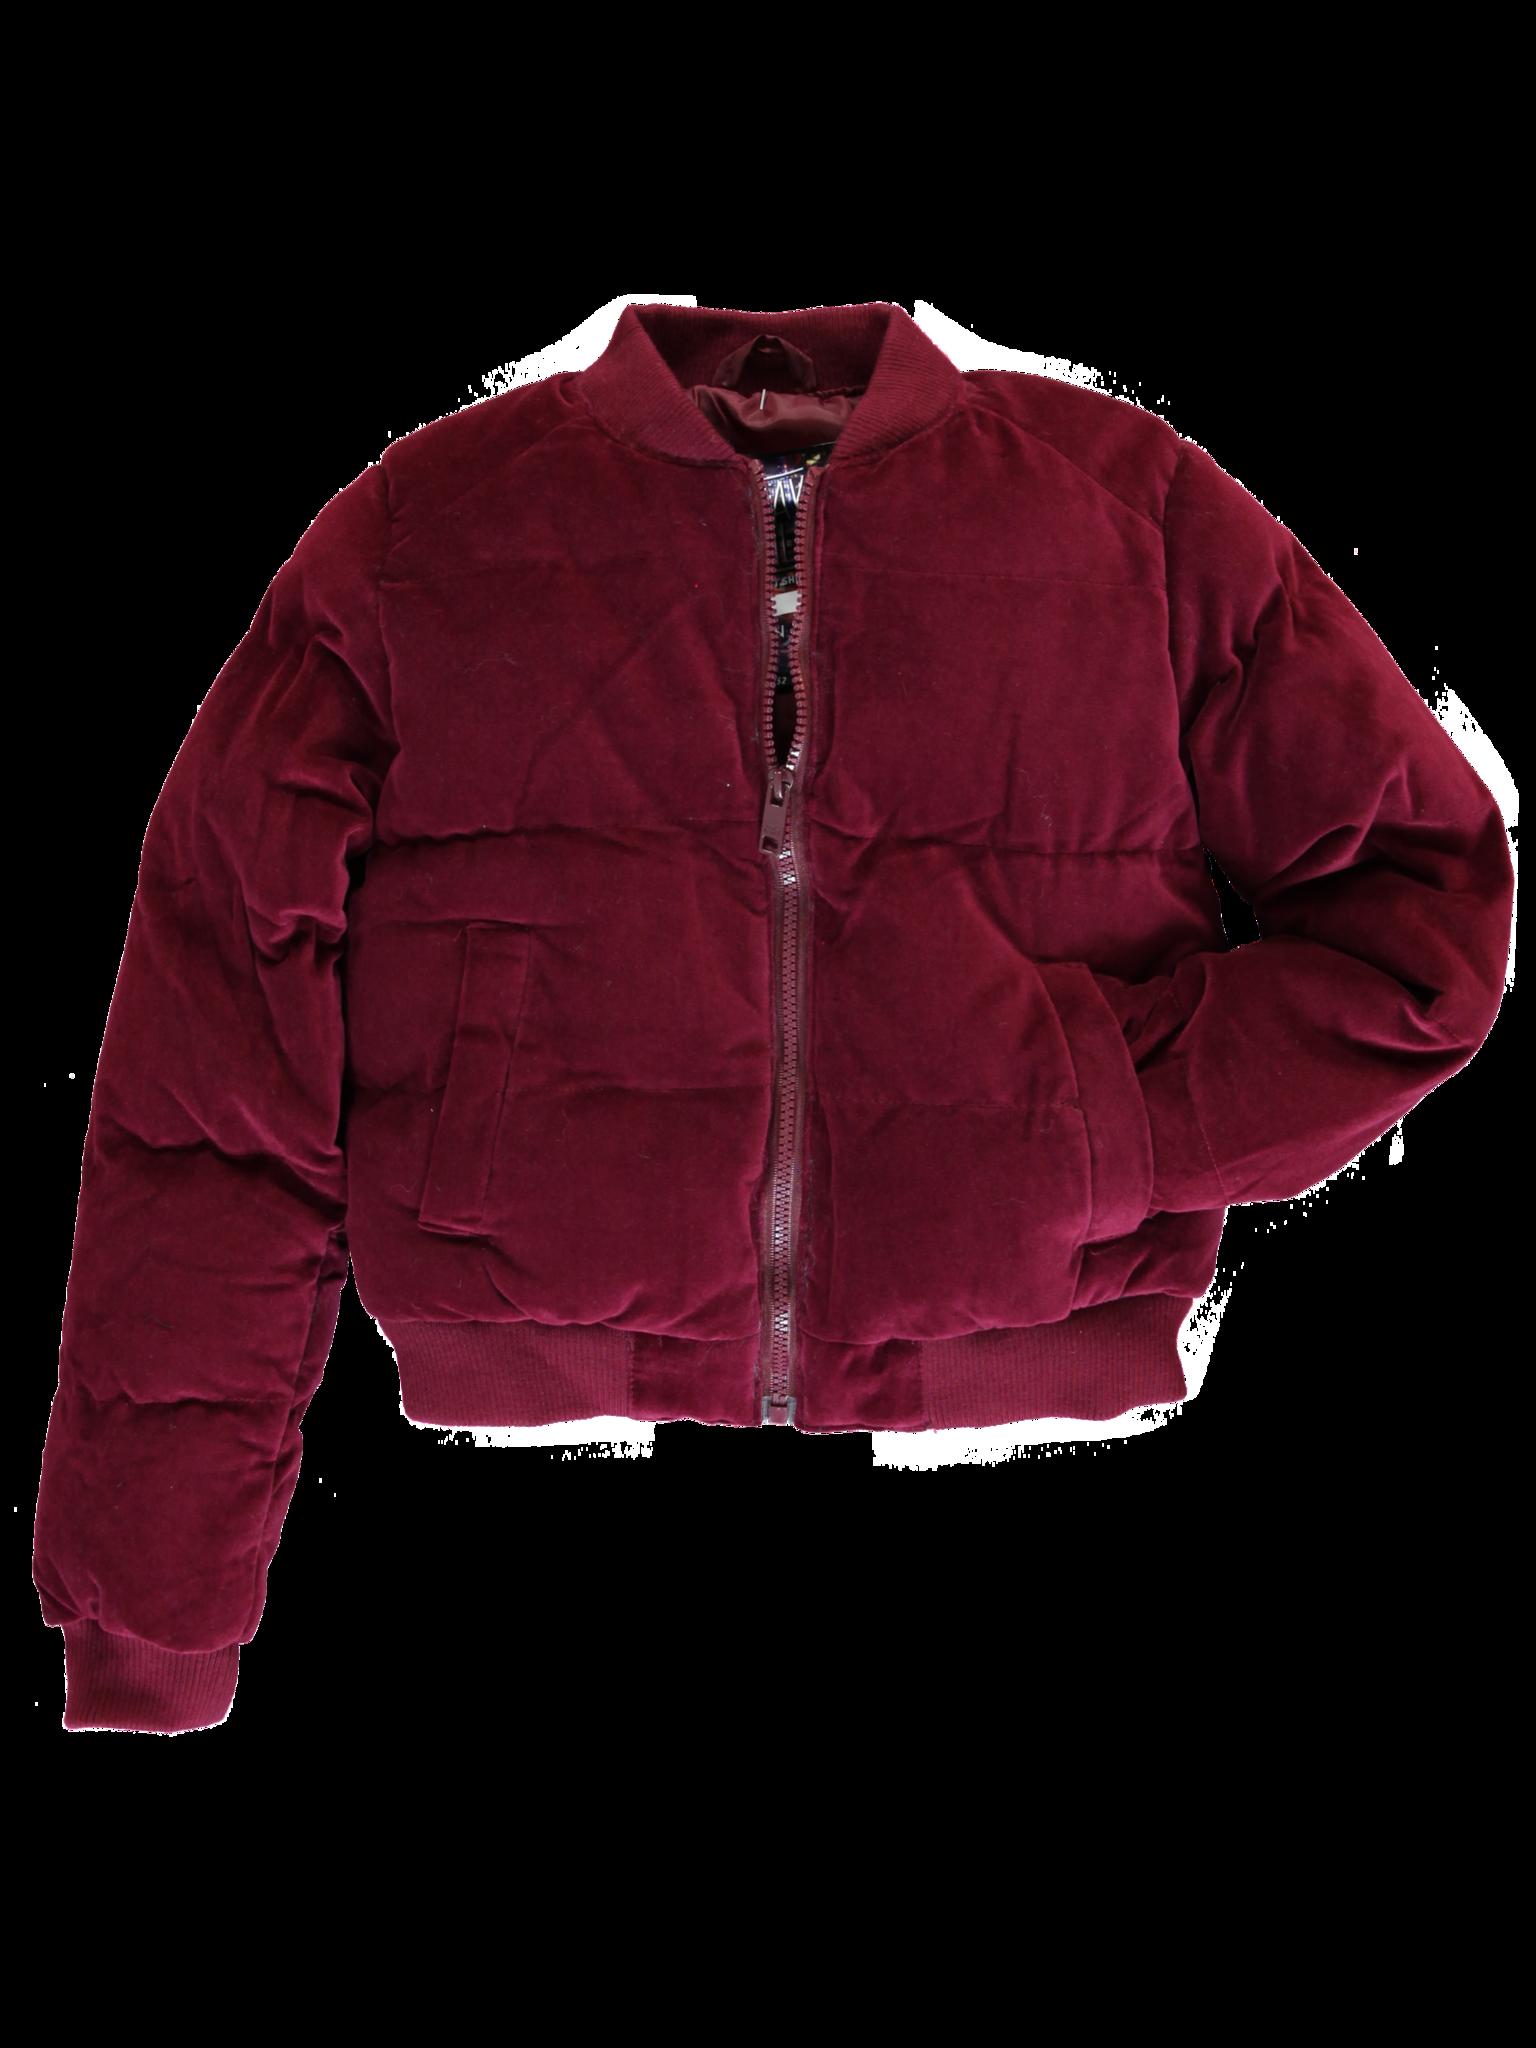 All Brands | Winterproducts Teen Girls | Jacket | 10 pcs/box